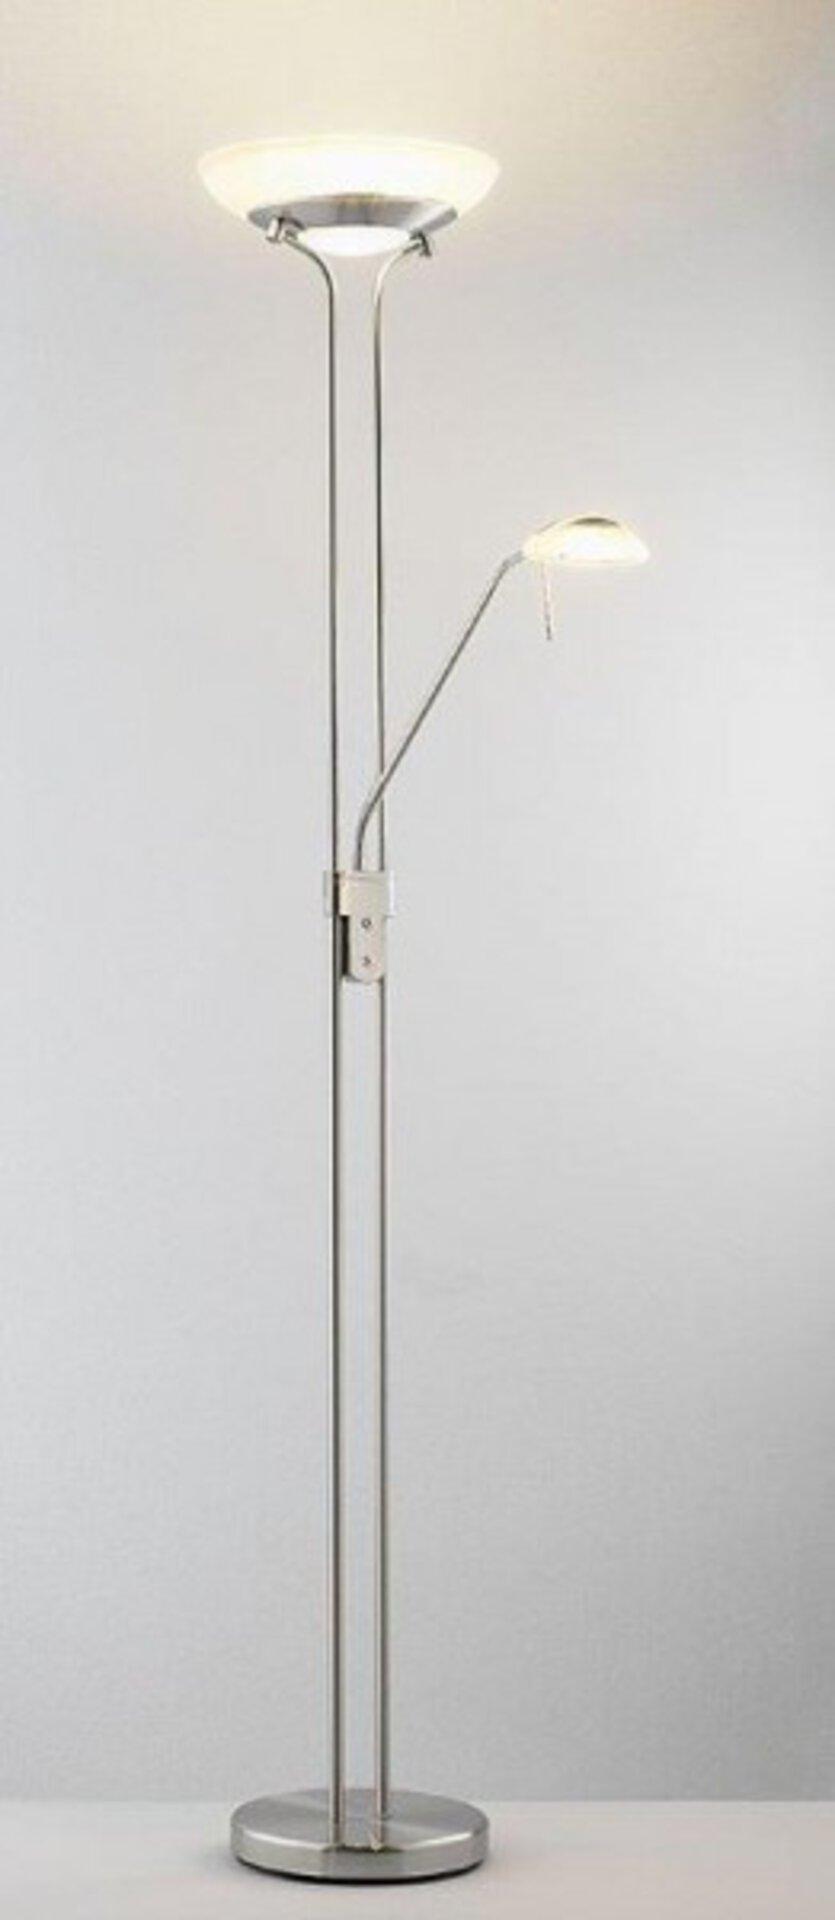 Stehleuchte Even II Casa Nova Metall 33 x 180 x 33 cm